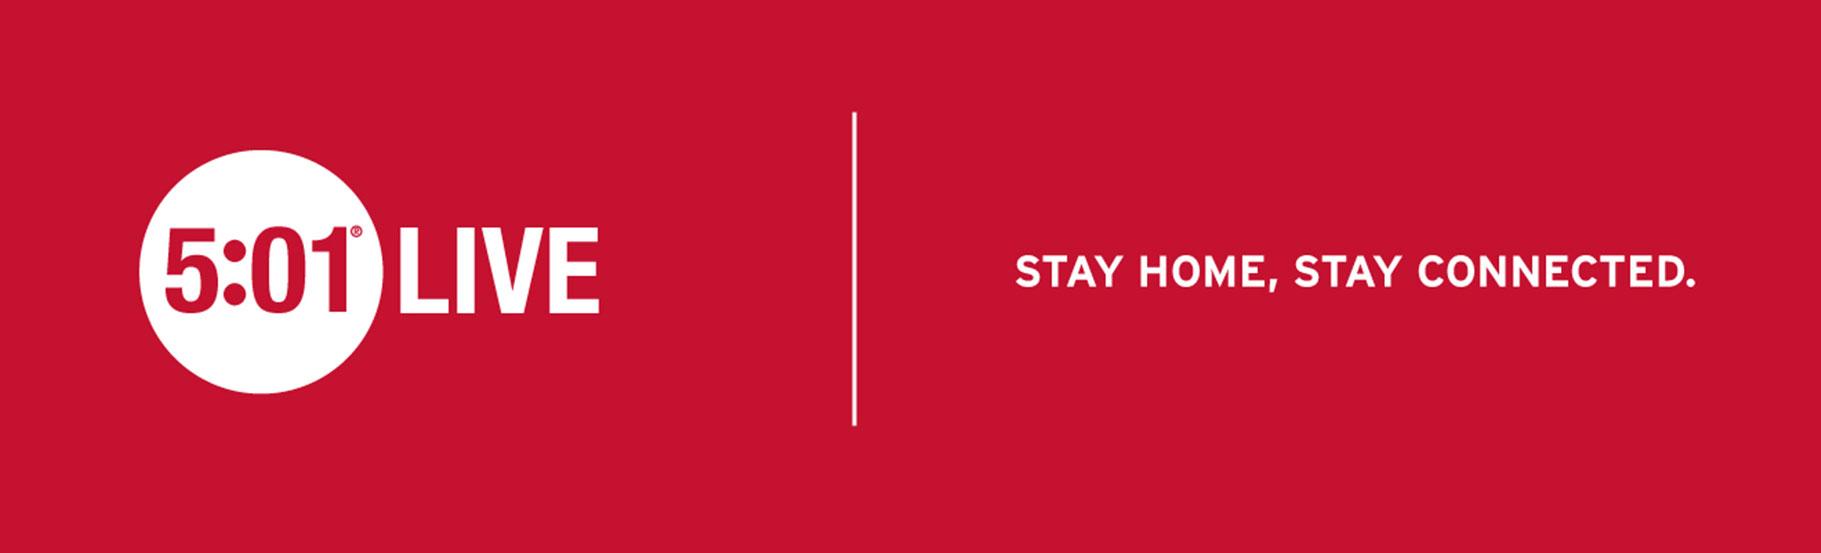 reklama levisova za Covid sa sloganom stay home, stay connected